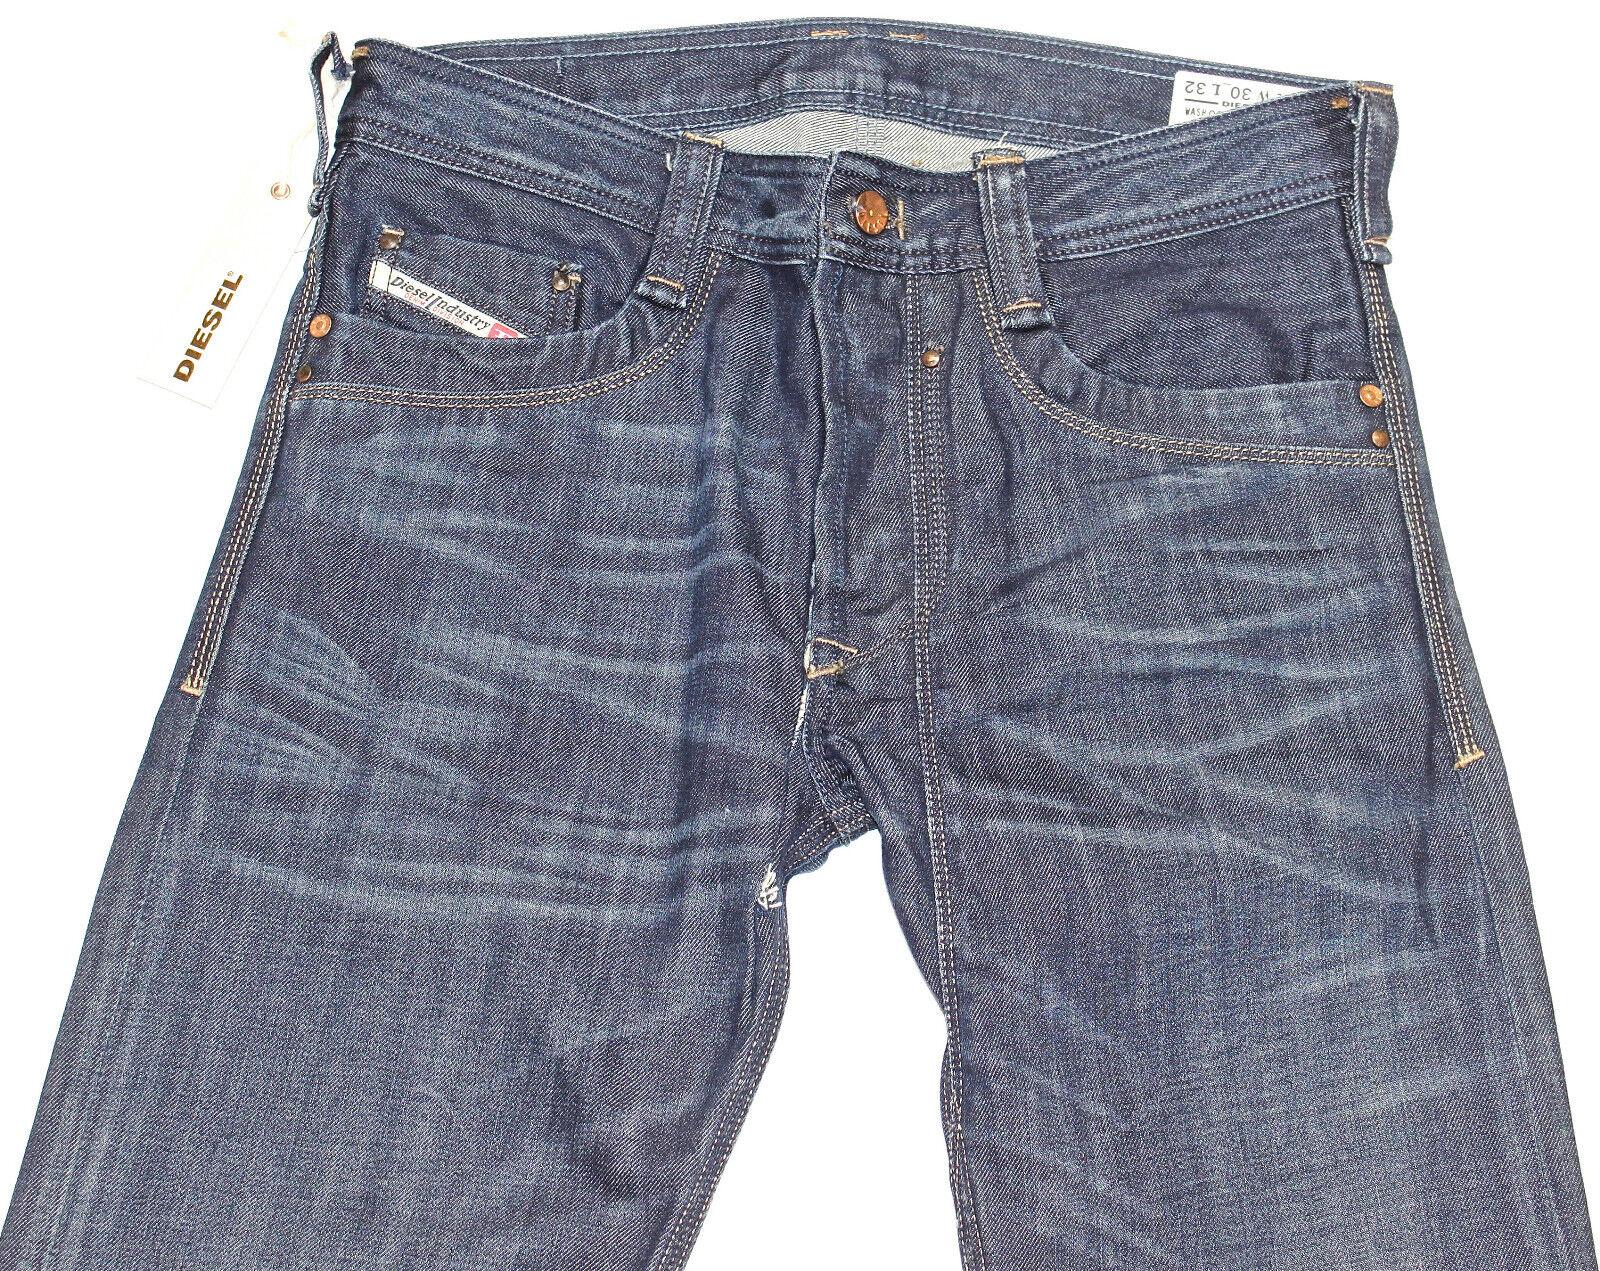 DIESEL Nuovo di Zecca TIMMEN 885 S Jeans 30X32 Regular Fit Straight Leg 0885 S